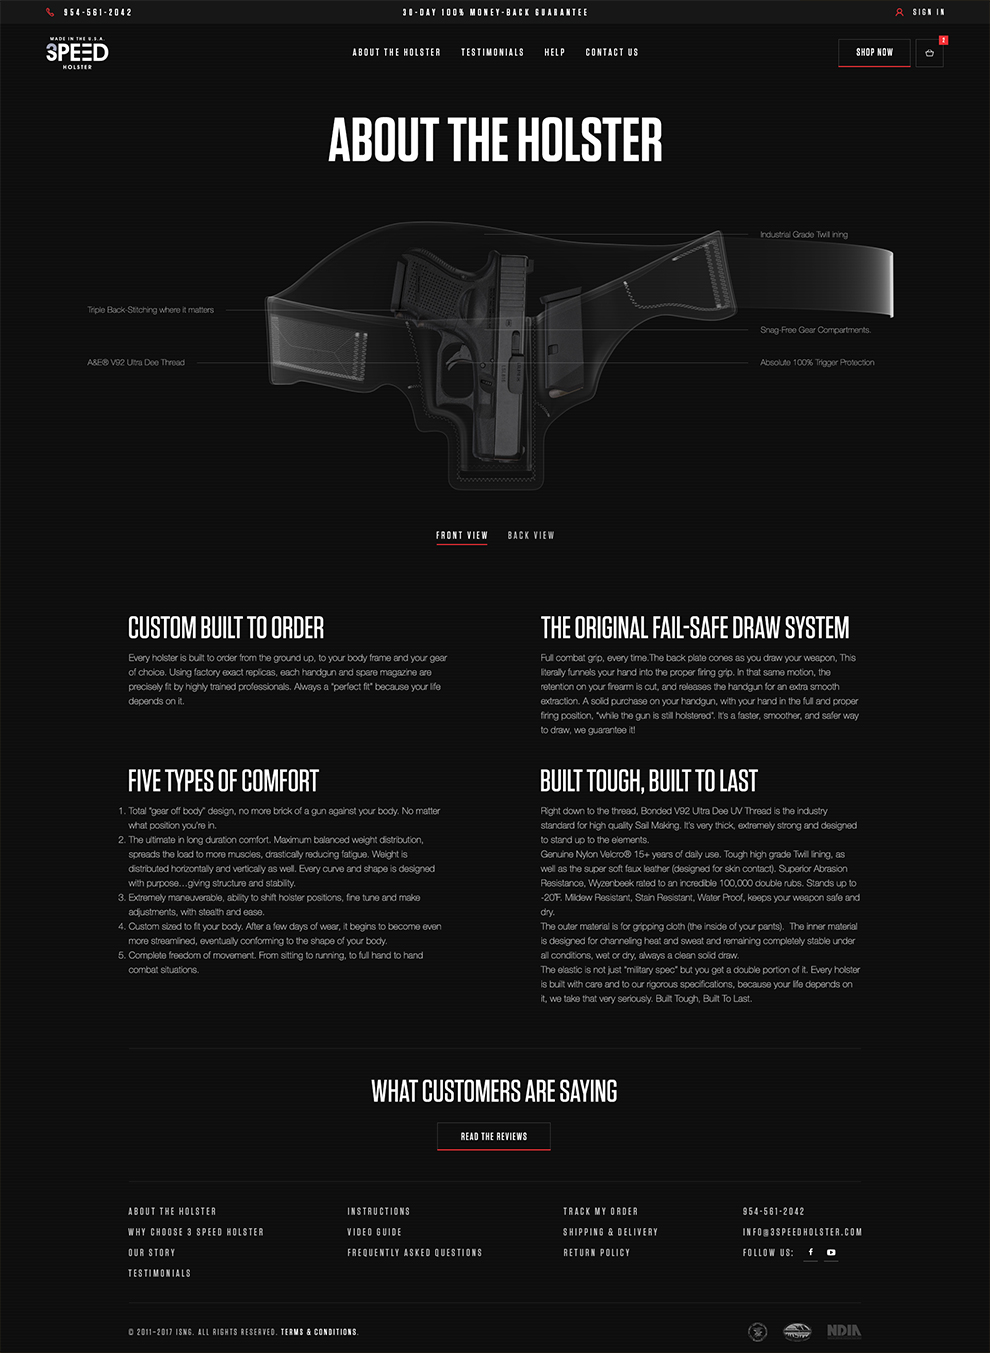 3 Speed Holster Web Design